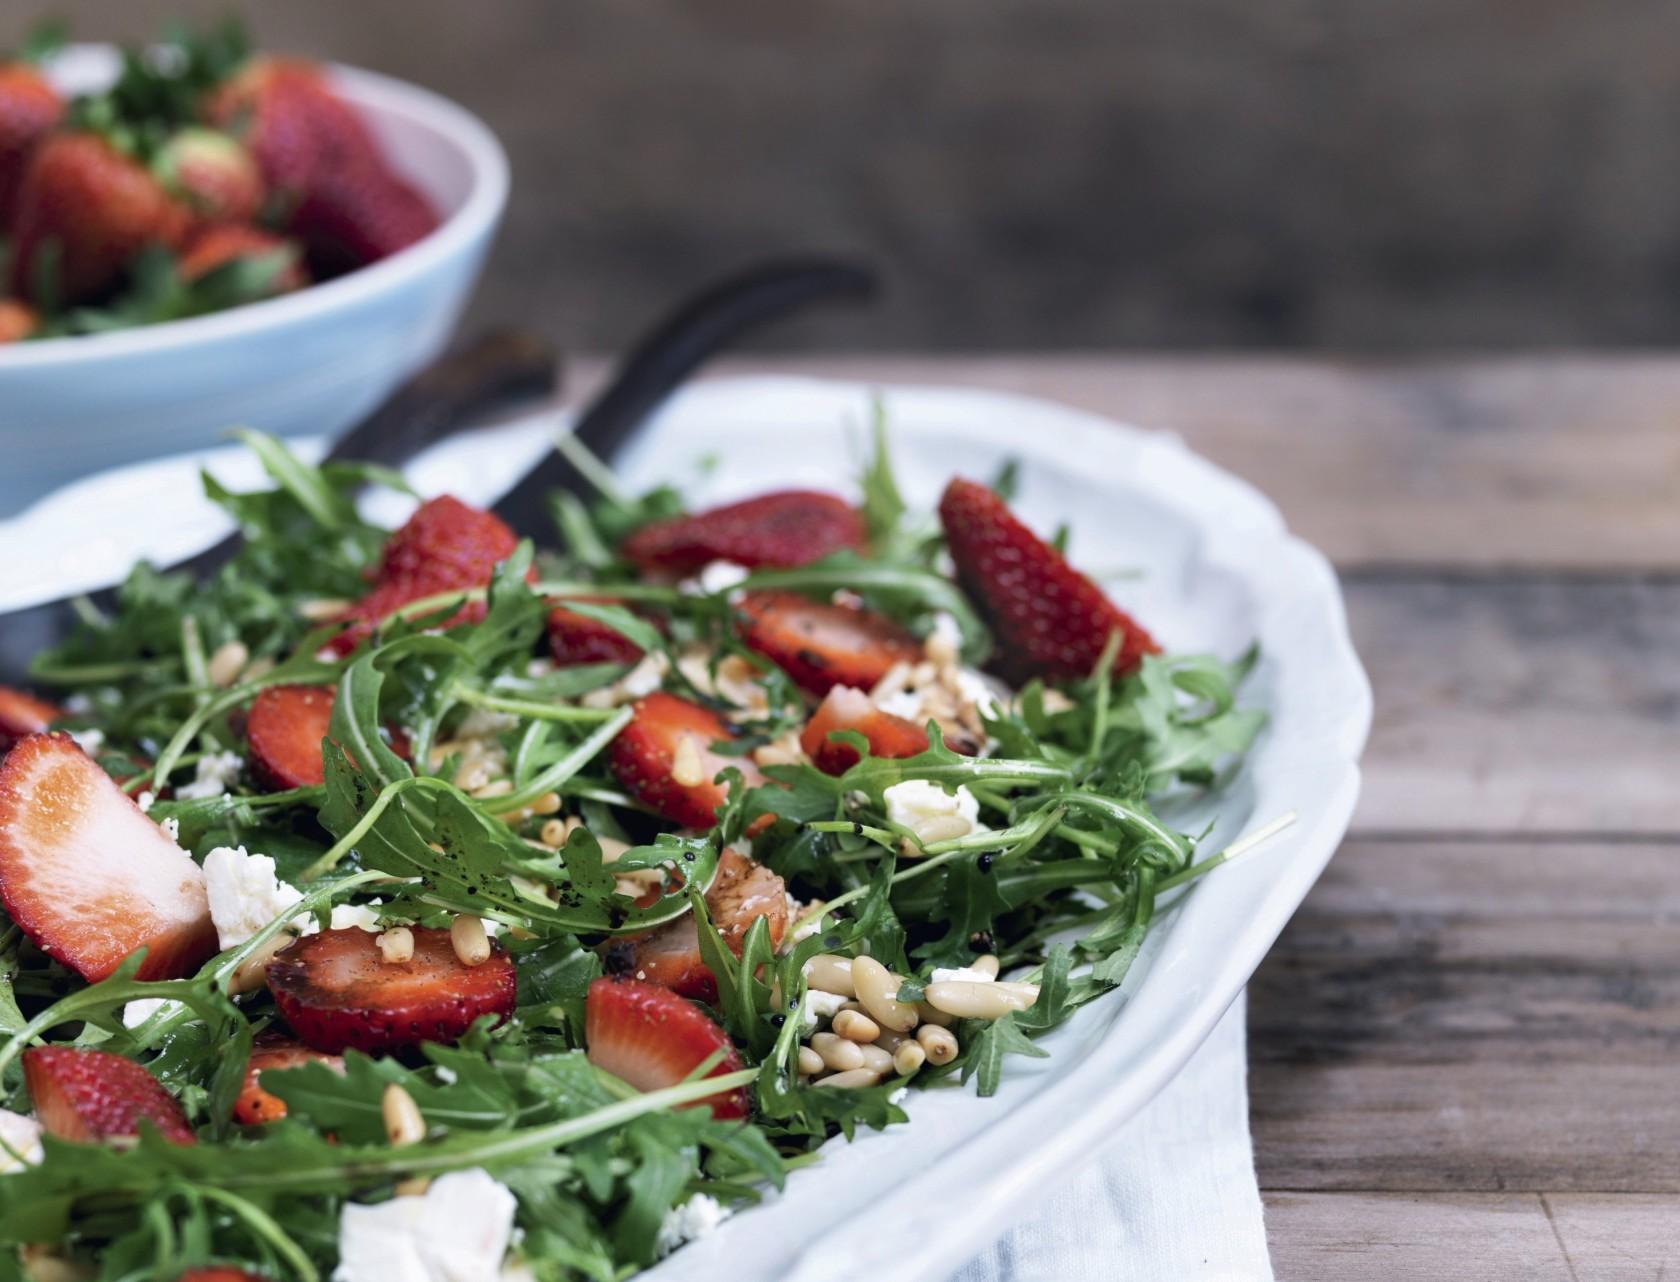 Lækker jordbærsalat med pinjekerner og feta